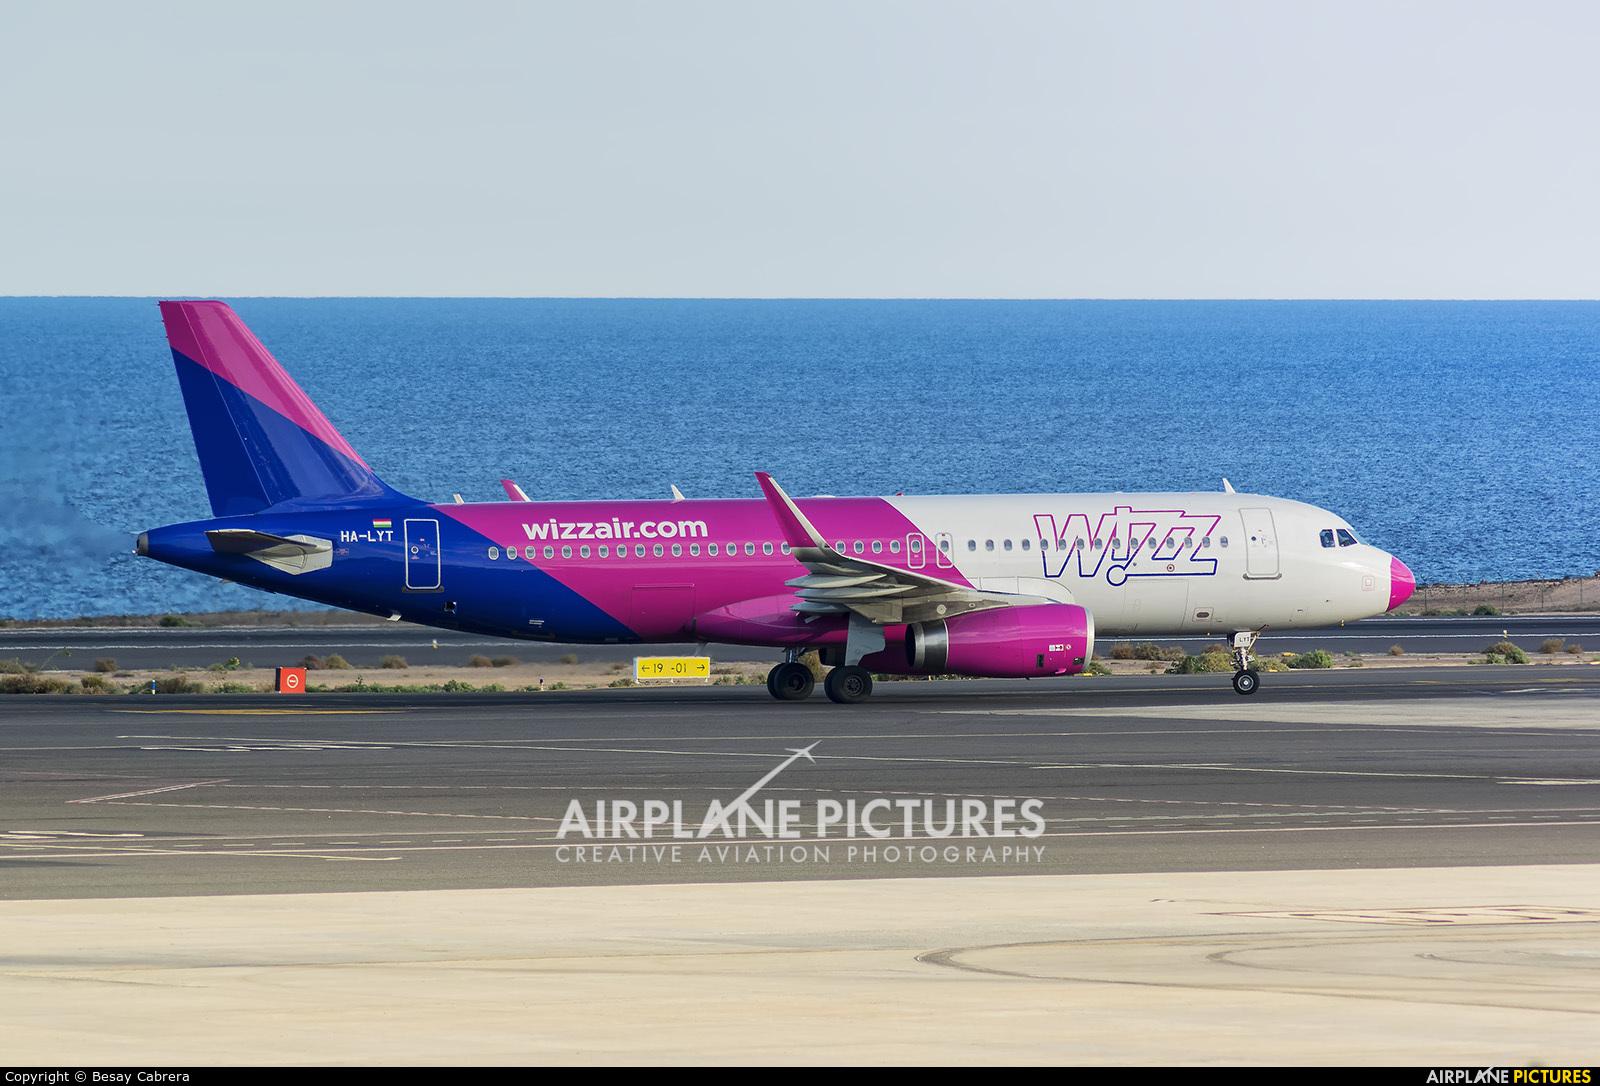 Wizz Air HA-LYT aircraft at Fuerteventura - Puerto del Rosario